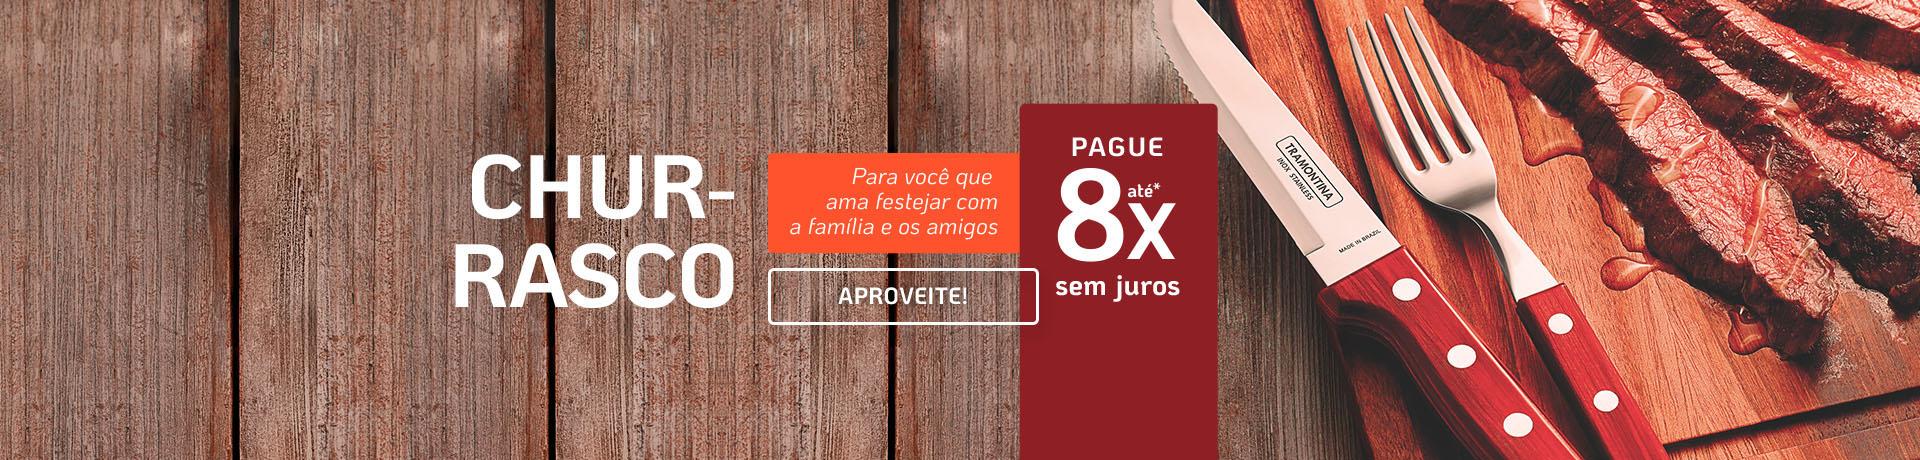 A4- Churrasco